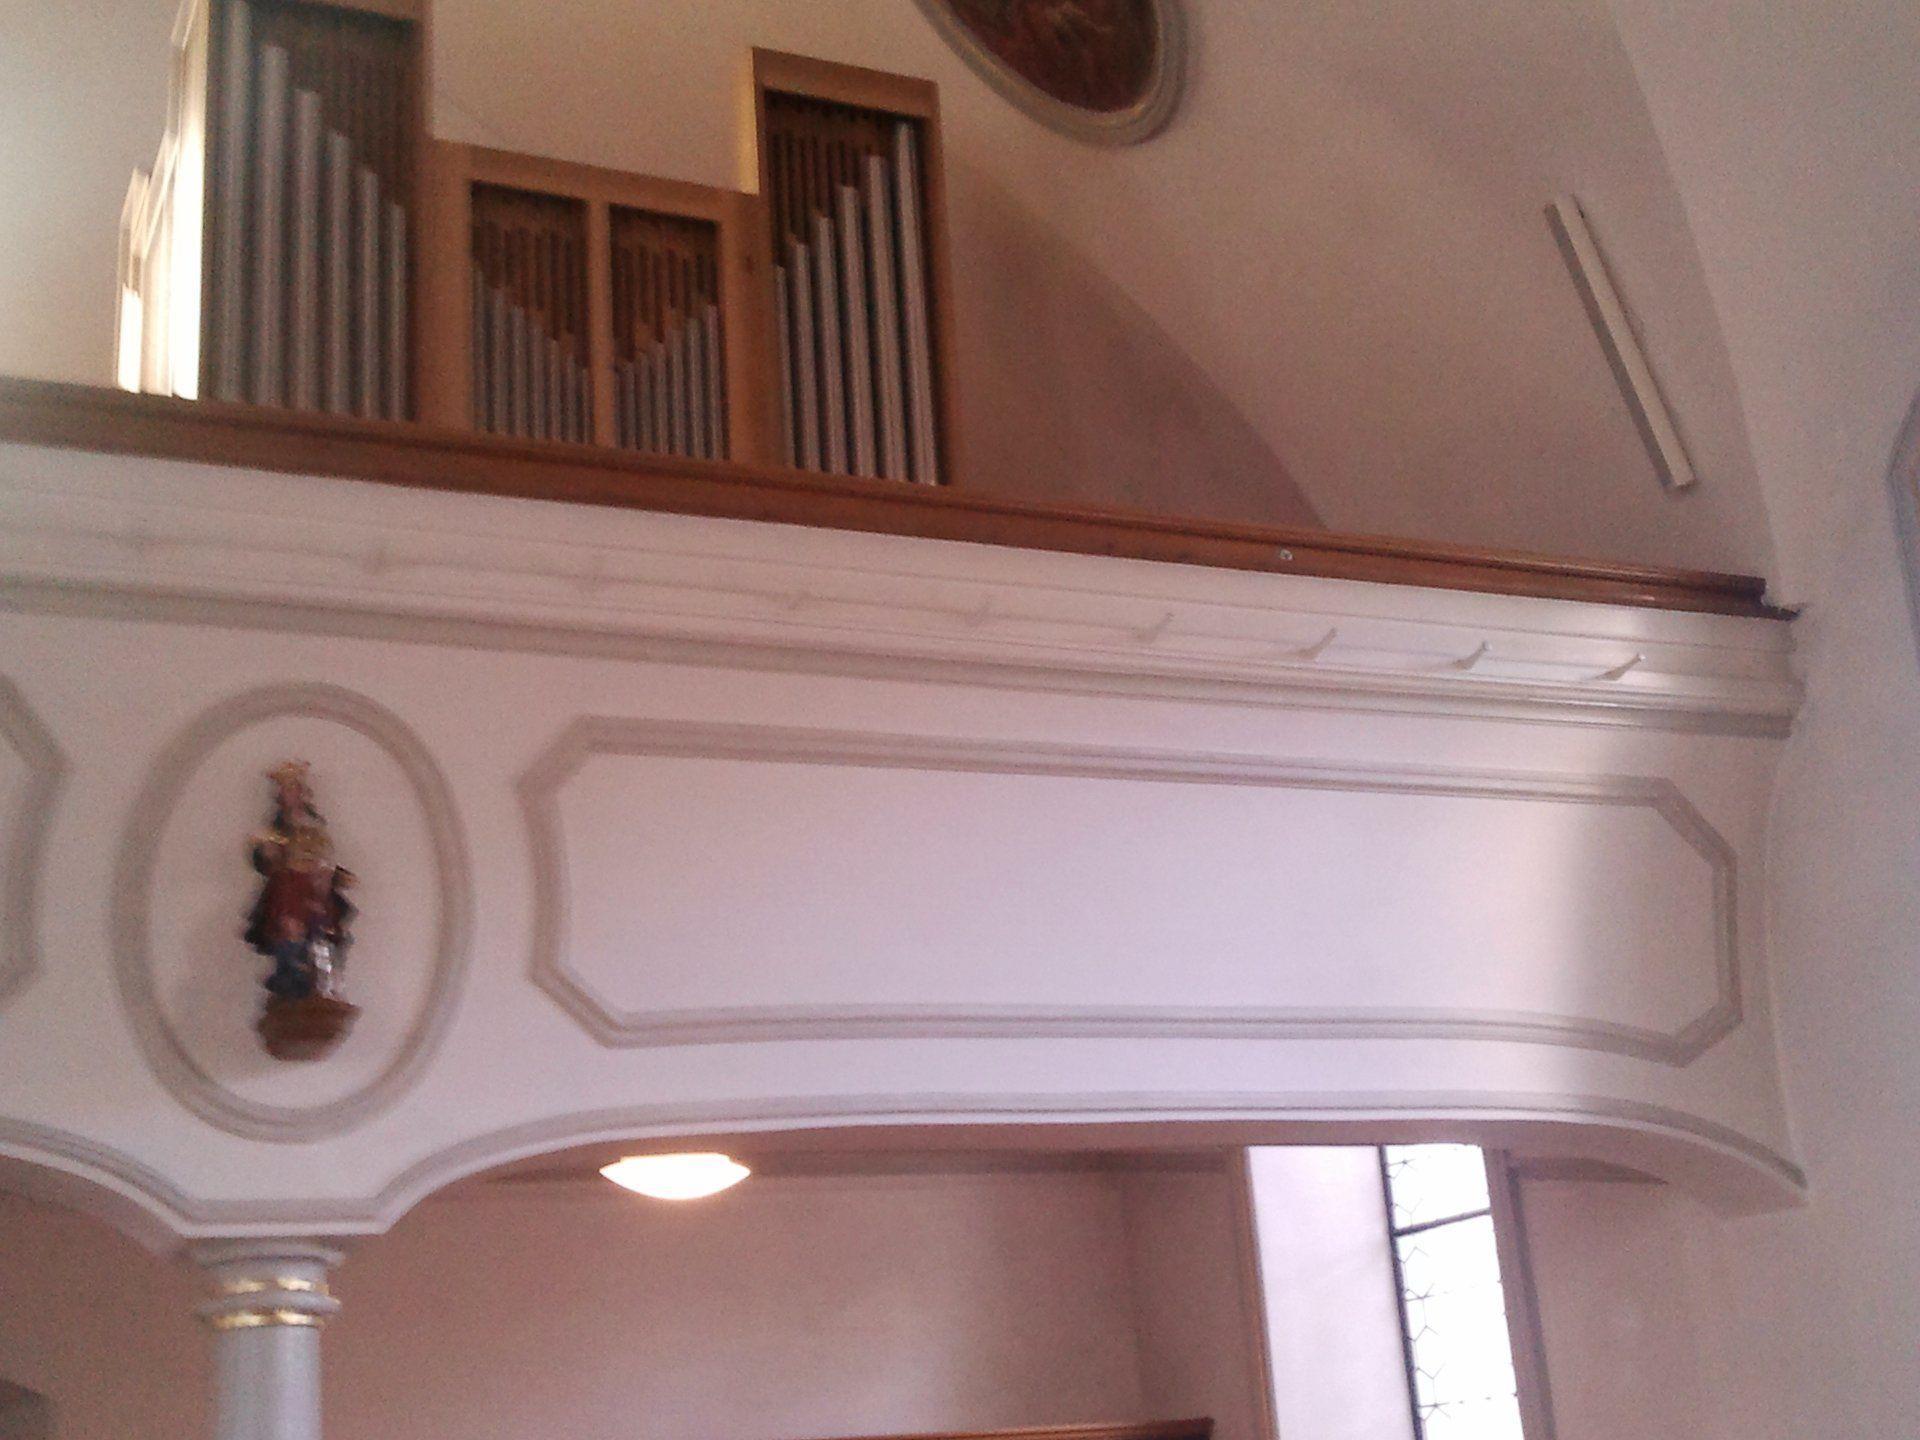 Orgelaufbau Fa. Pflüger in Pfarrkirche St. Agatha Meiningen